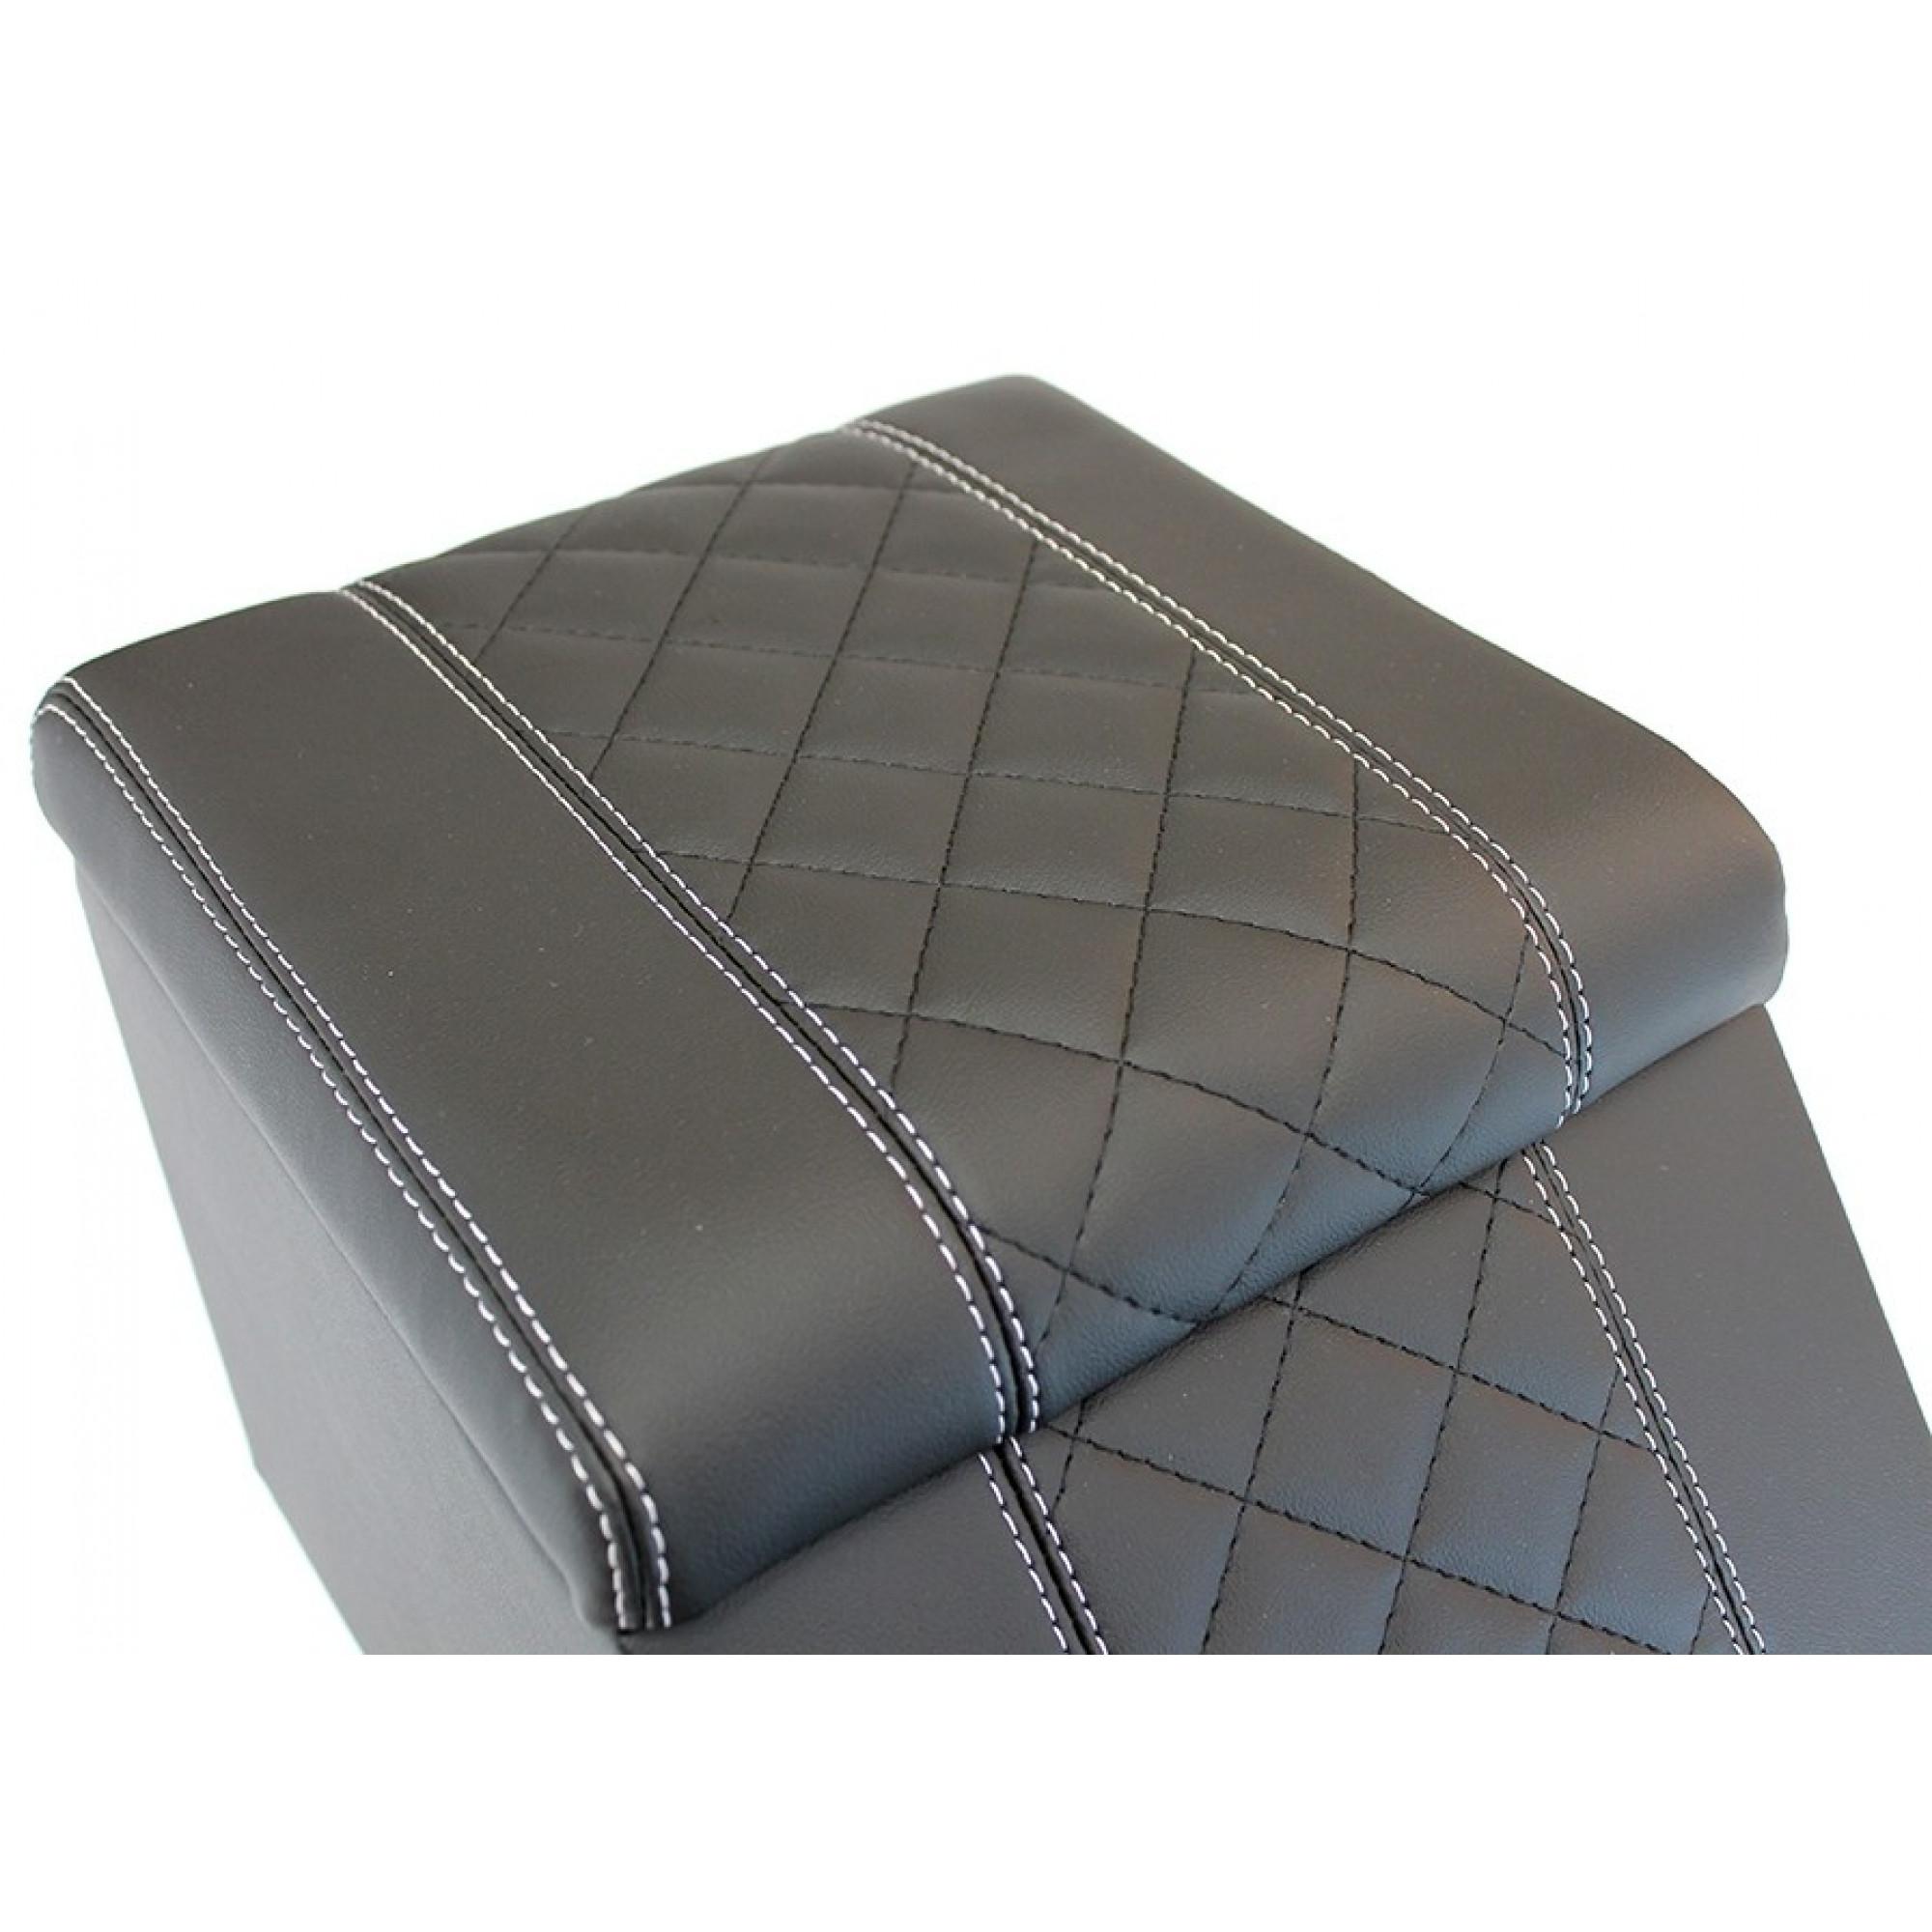 Diamond Box Xl >> Premium Xl Cubby Box Diamond Xs Black Leather White Stitch Ext024prem Dxsl